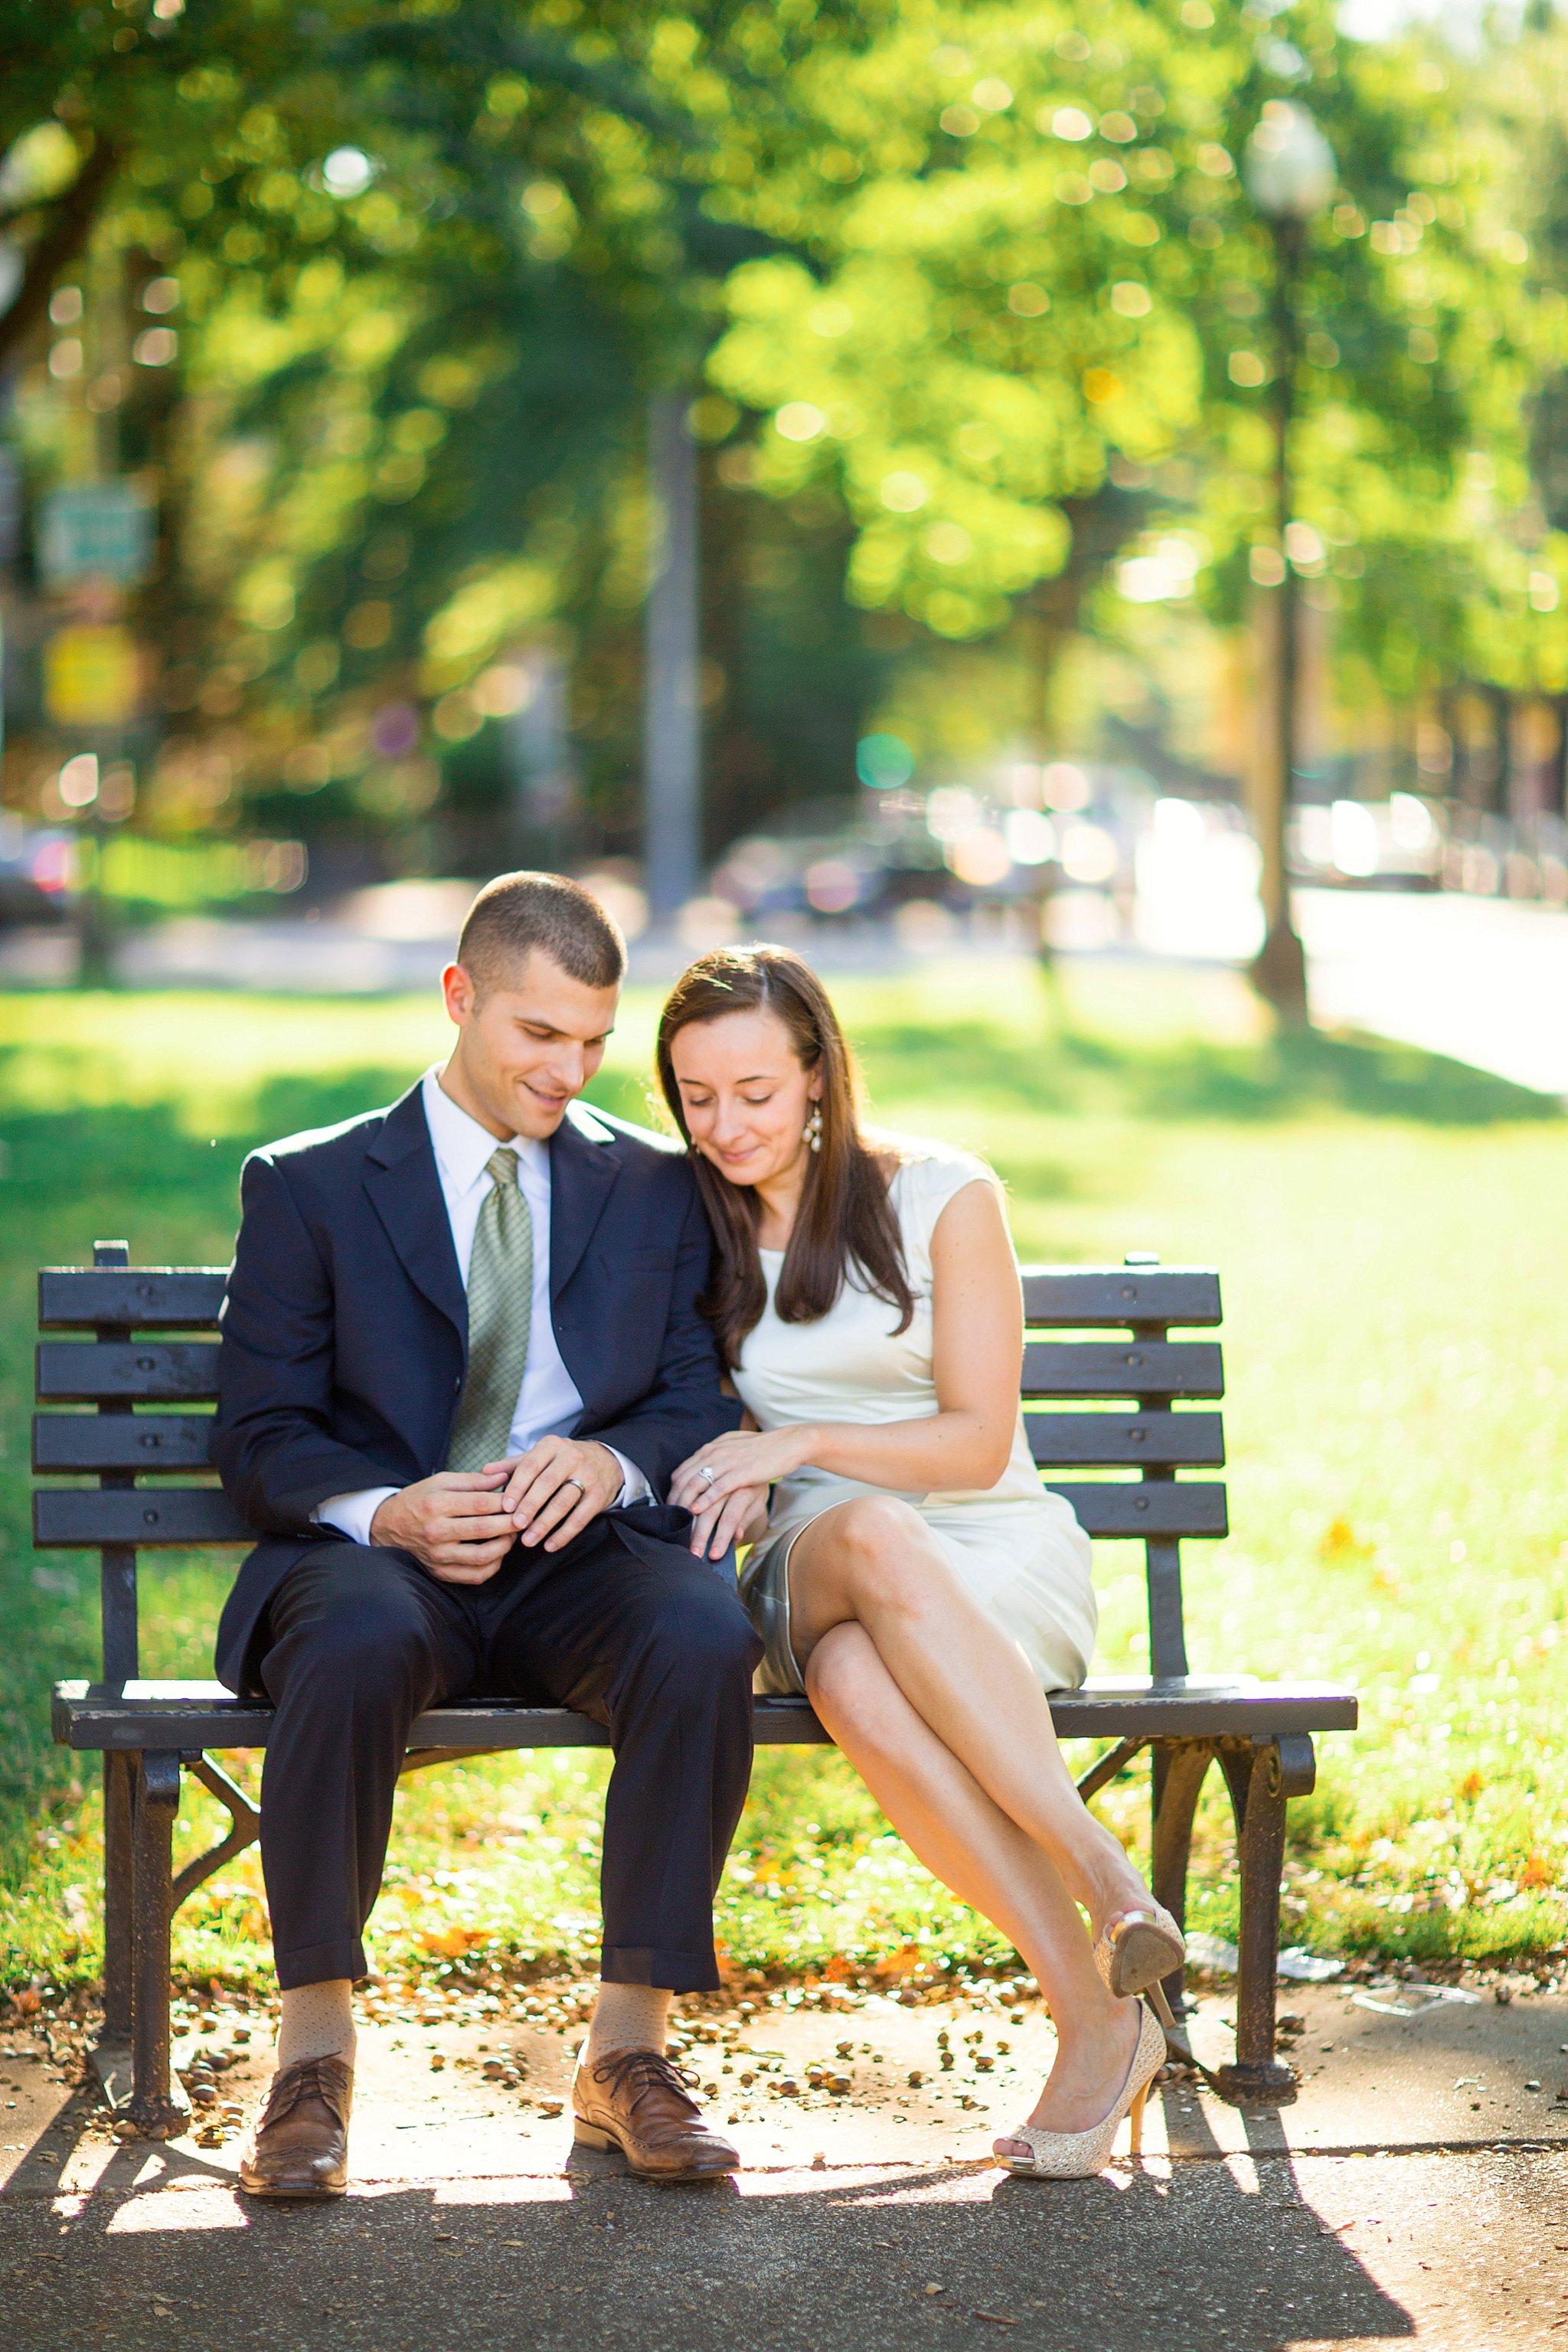 wedding photographers with best reviews washington DC